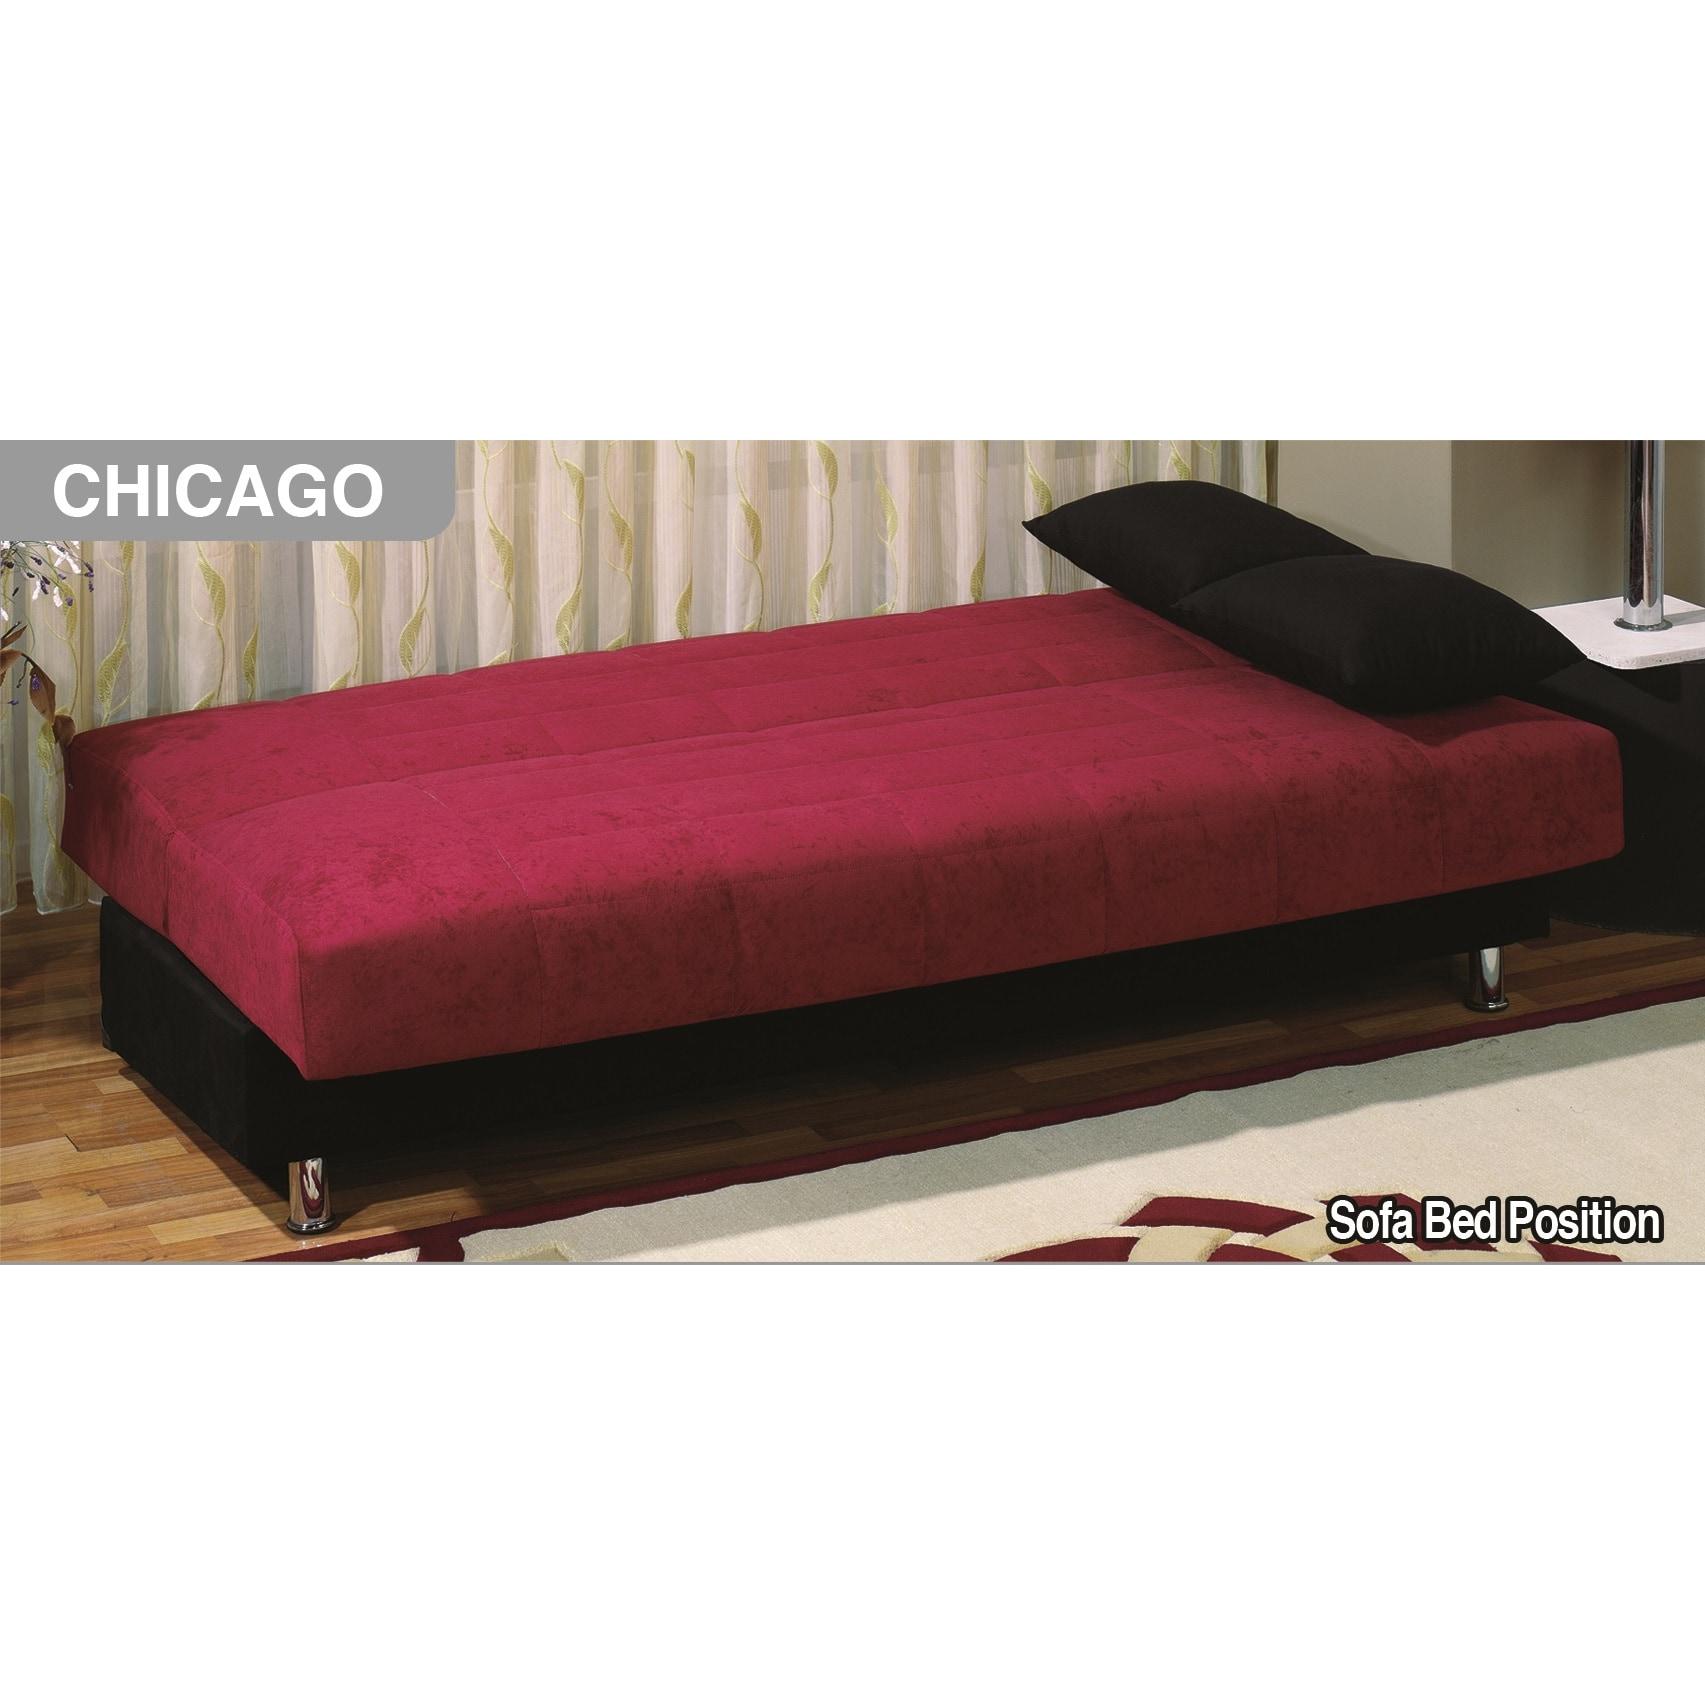 chicago sleeper futon sofabed   free shipping today   overstock     15243120 chicago sleeper futon sofabed   free shipping today   overstock      rh   overstock